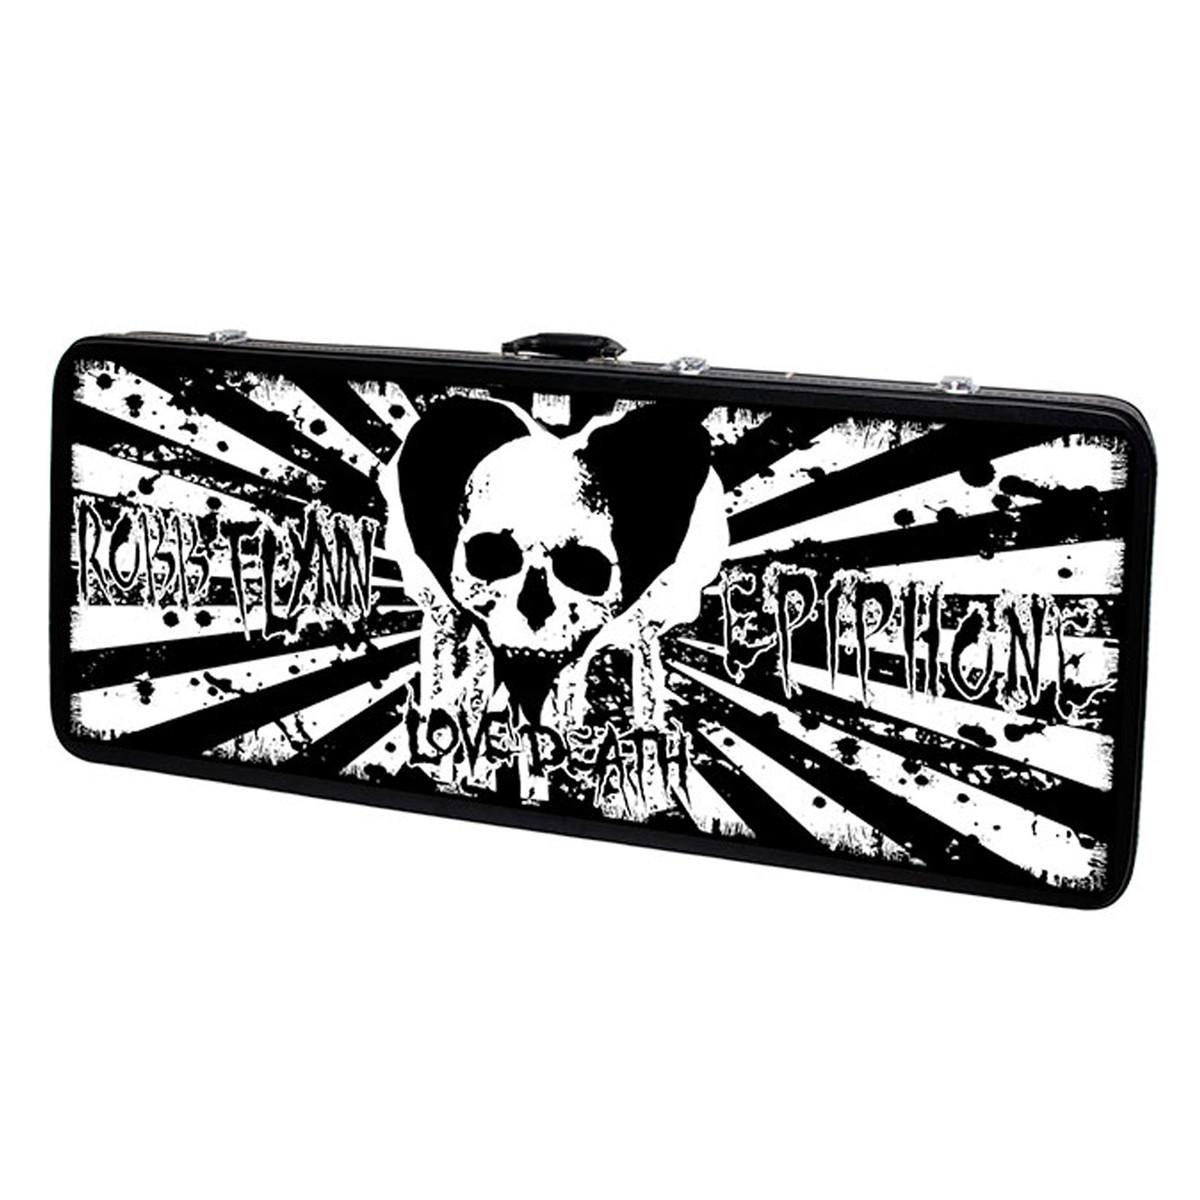 Epiphone Robb Flynn Baritone Flying V Electric Guitar, Love/Death at ...